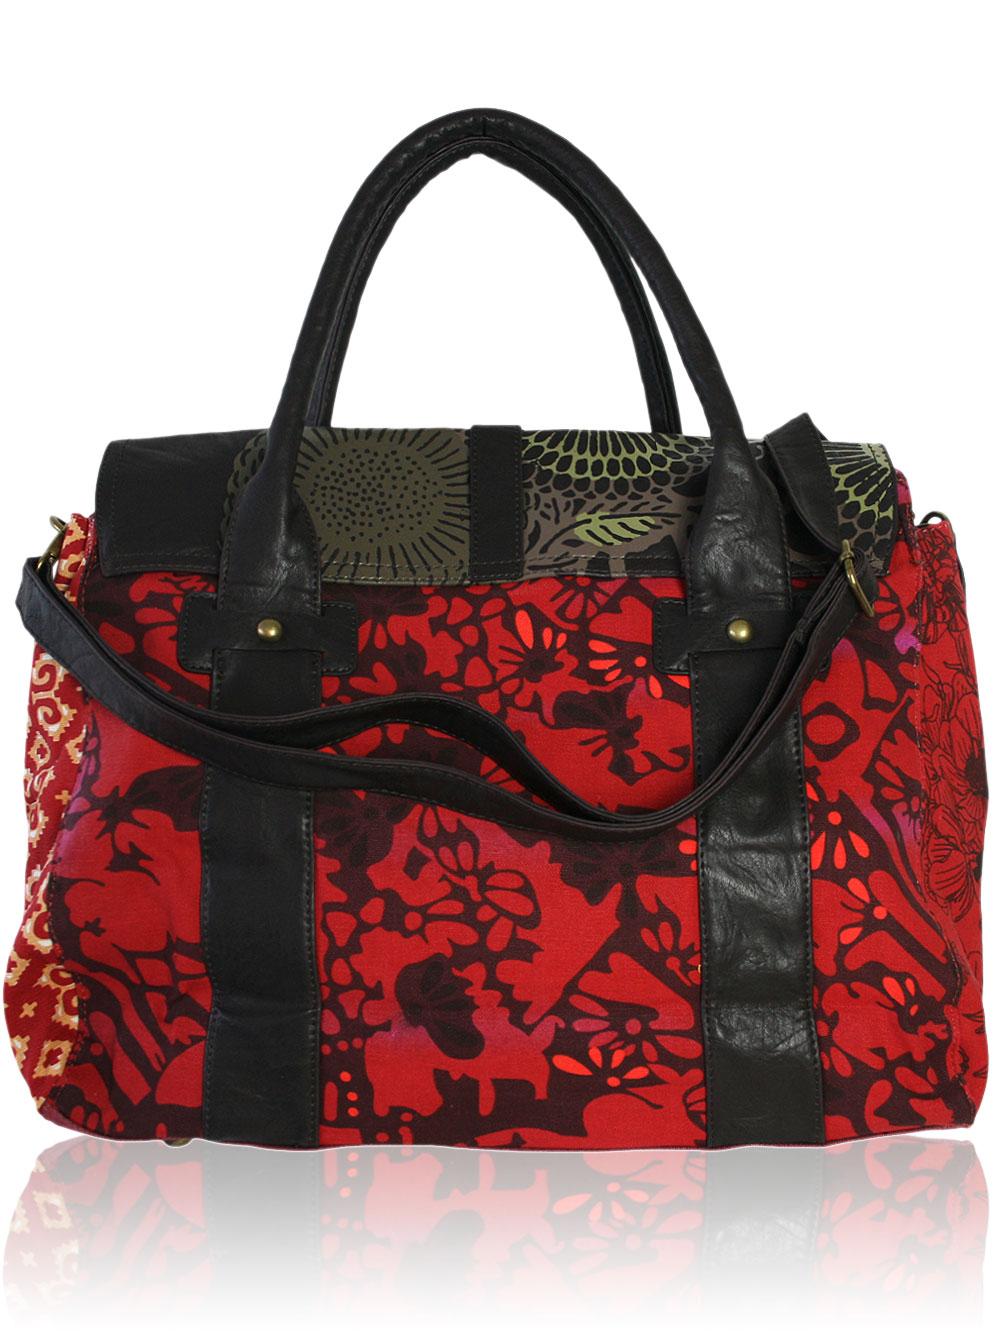 desigual damen handtasche granate big avator schwarz rot neu ebay. Black Bedroom Furniture Sets. Home Design Ideas